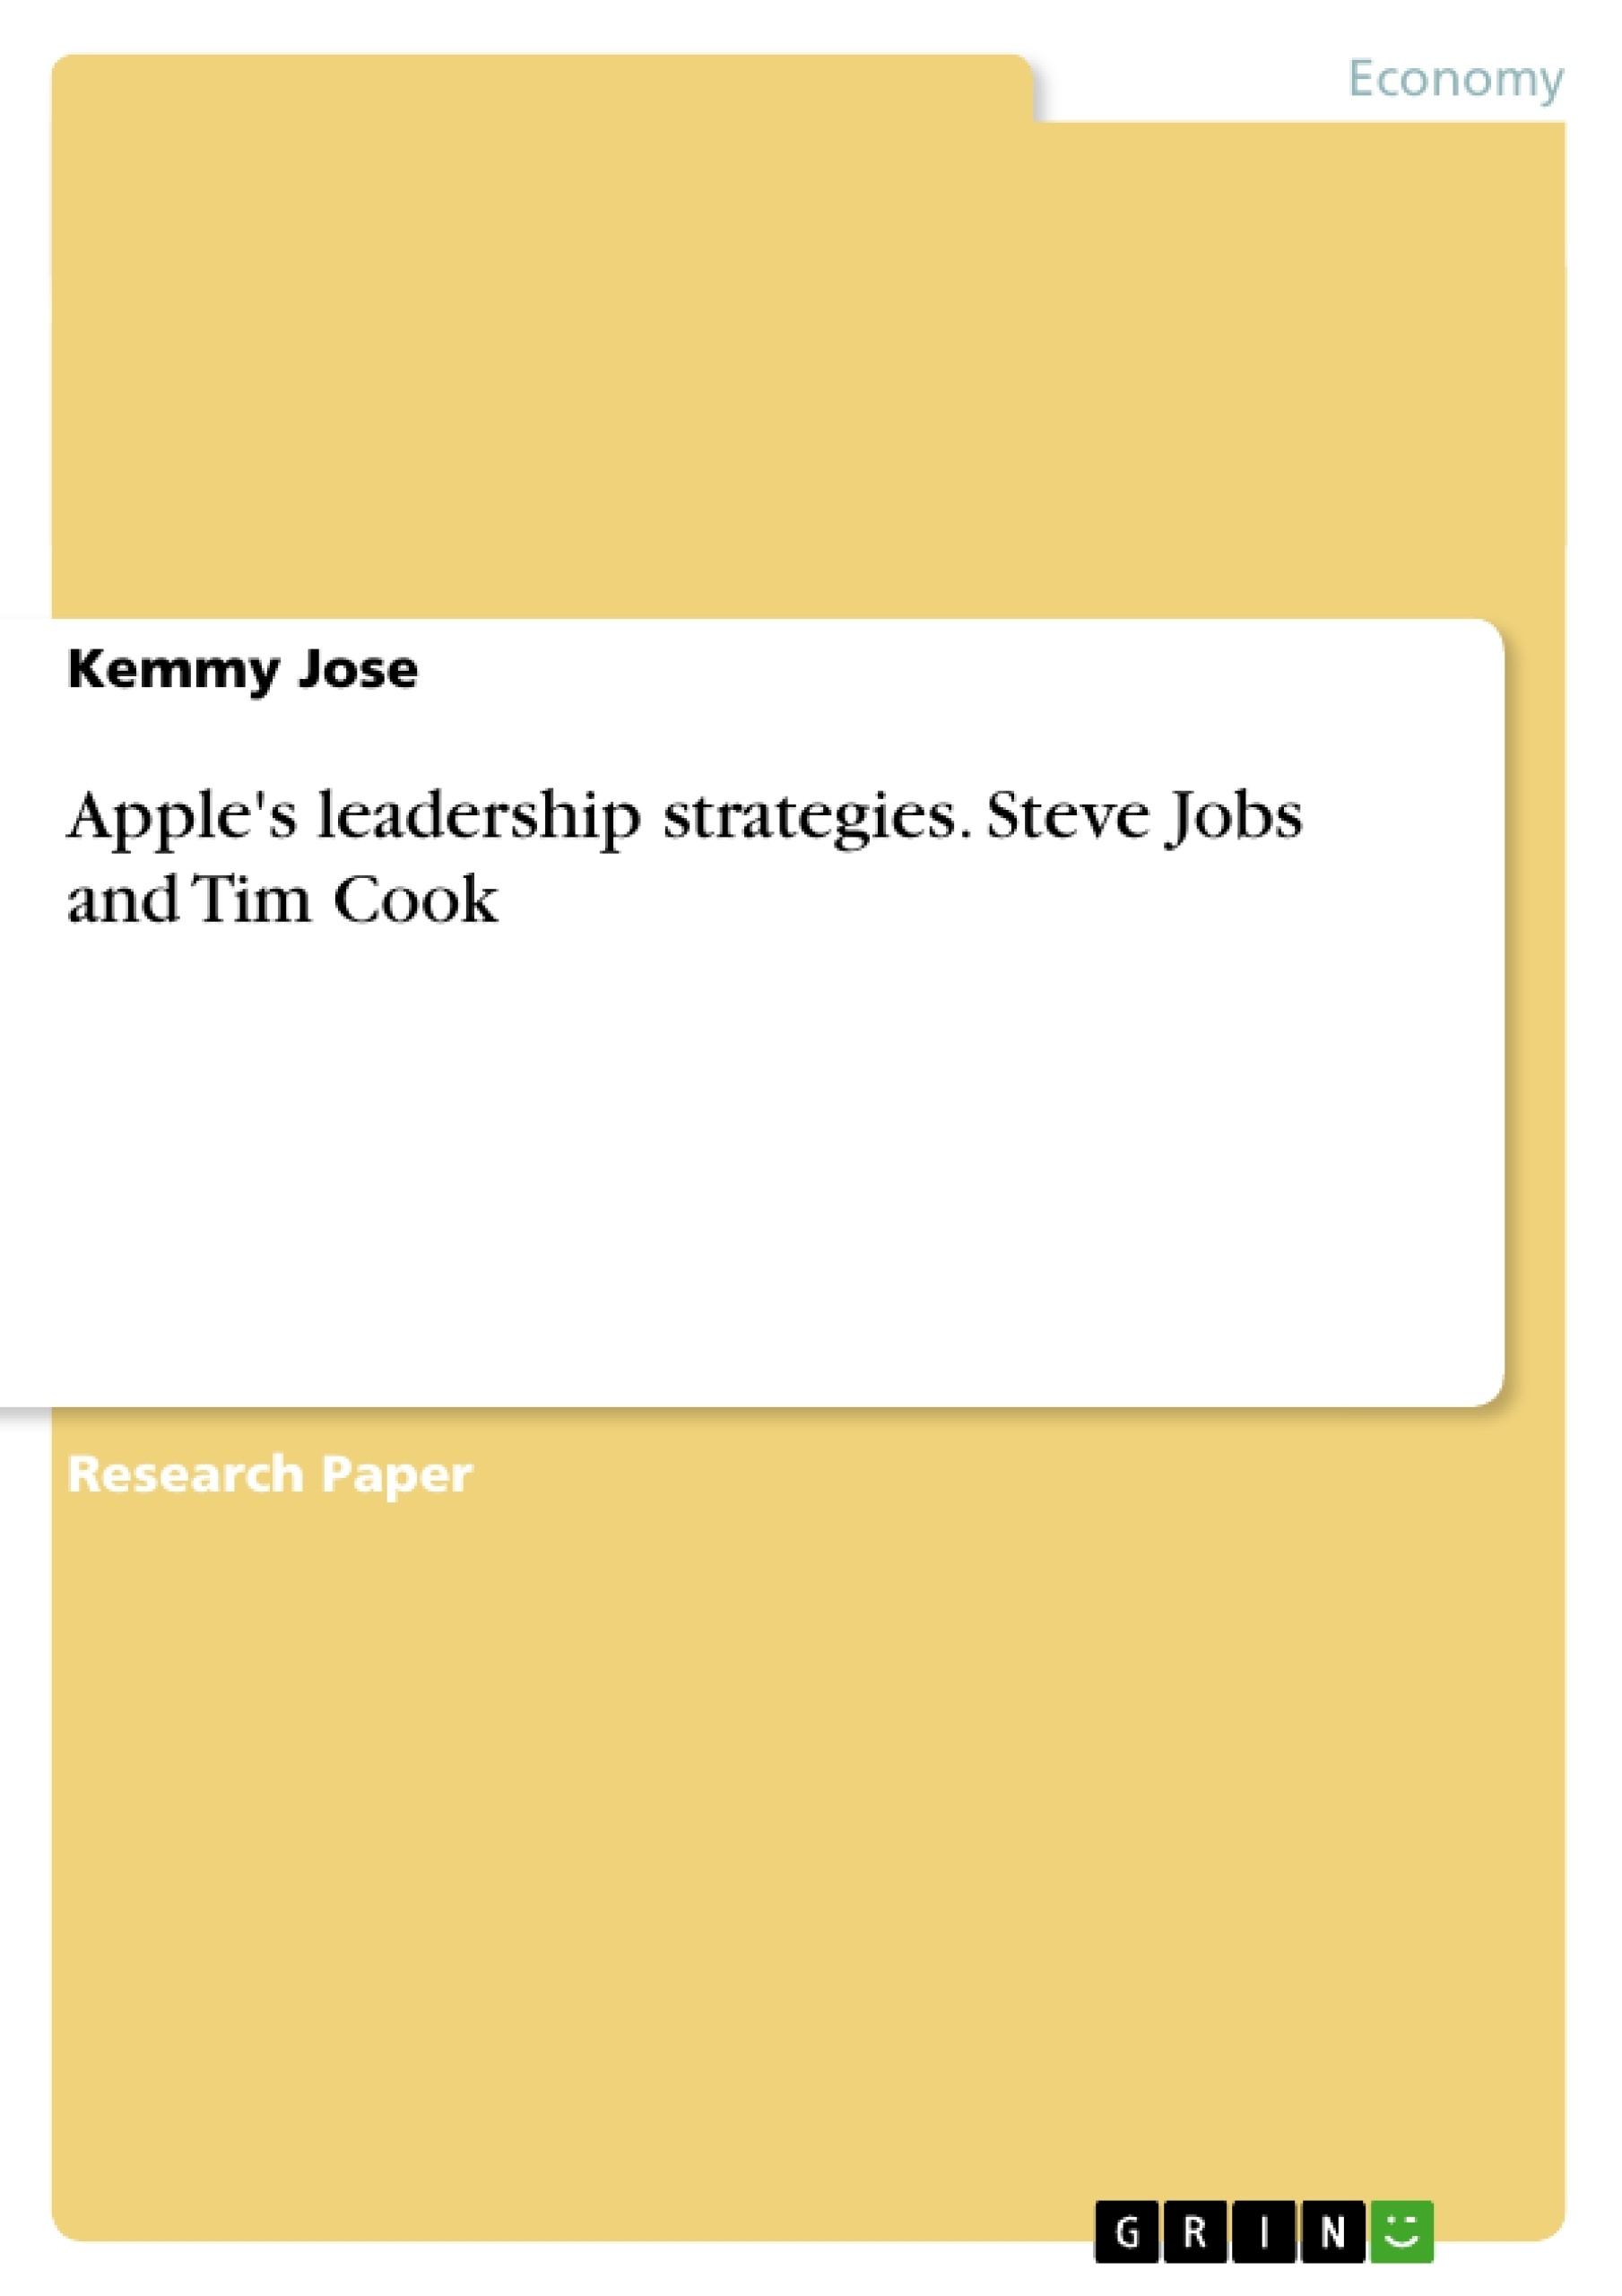 Title: Apple's leadership strategies. Steve Jobs and Tim Cook